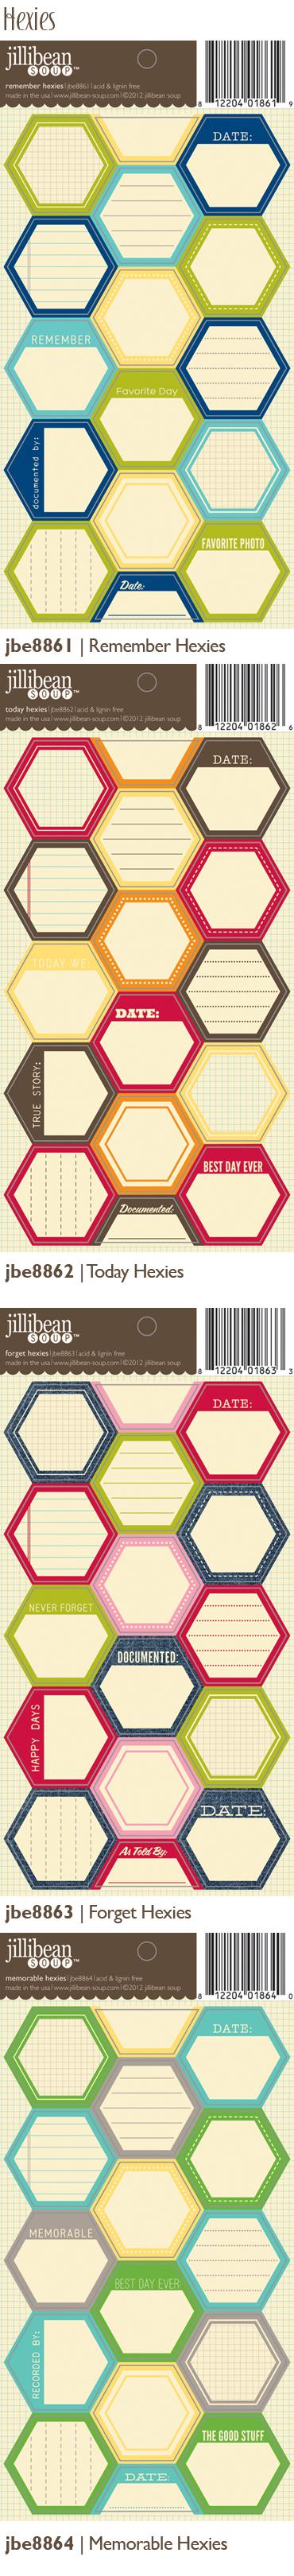 Hexies_Summer2012_BlogPreview